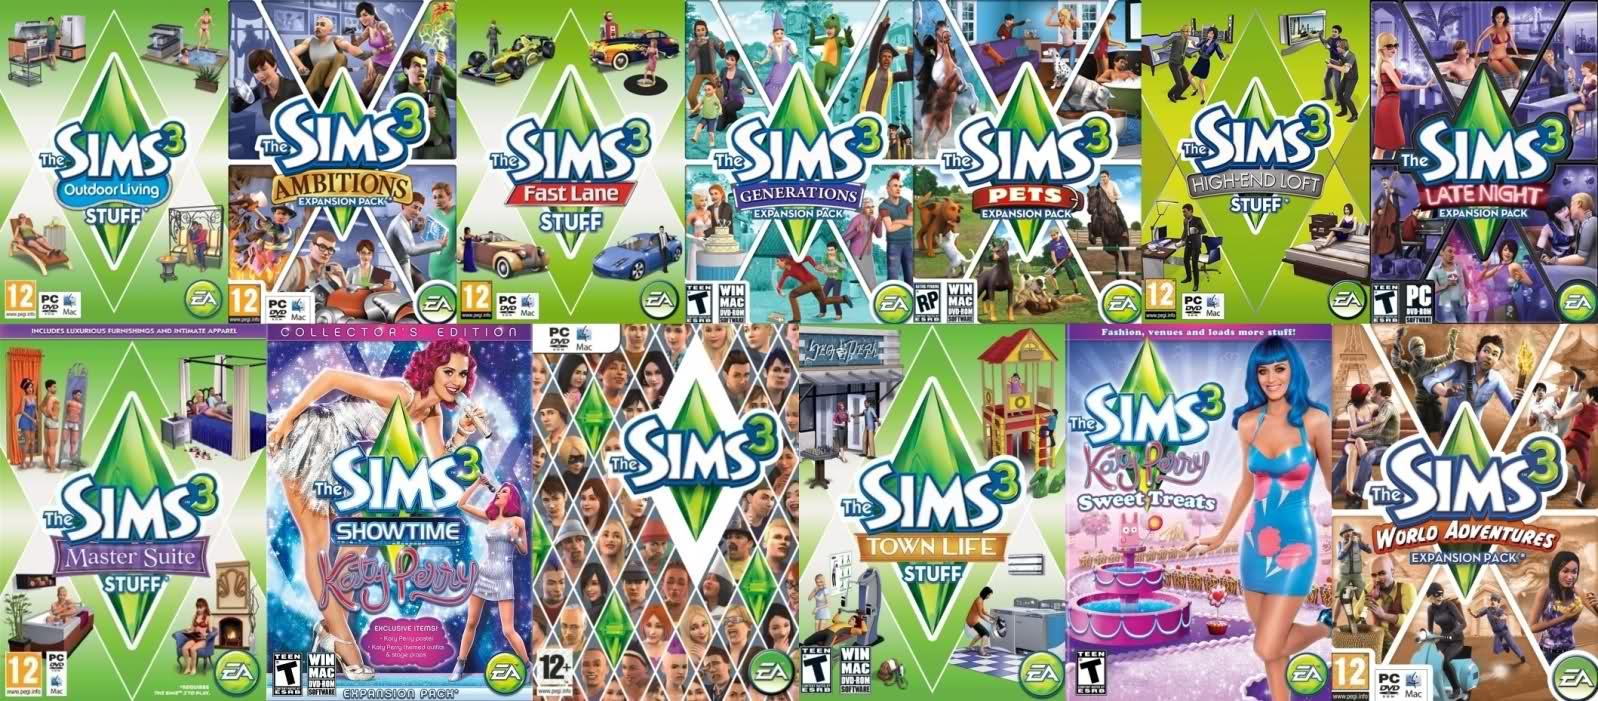 Download The Sims 3 Expansion Packs Lengkap - Maringngerrang